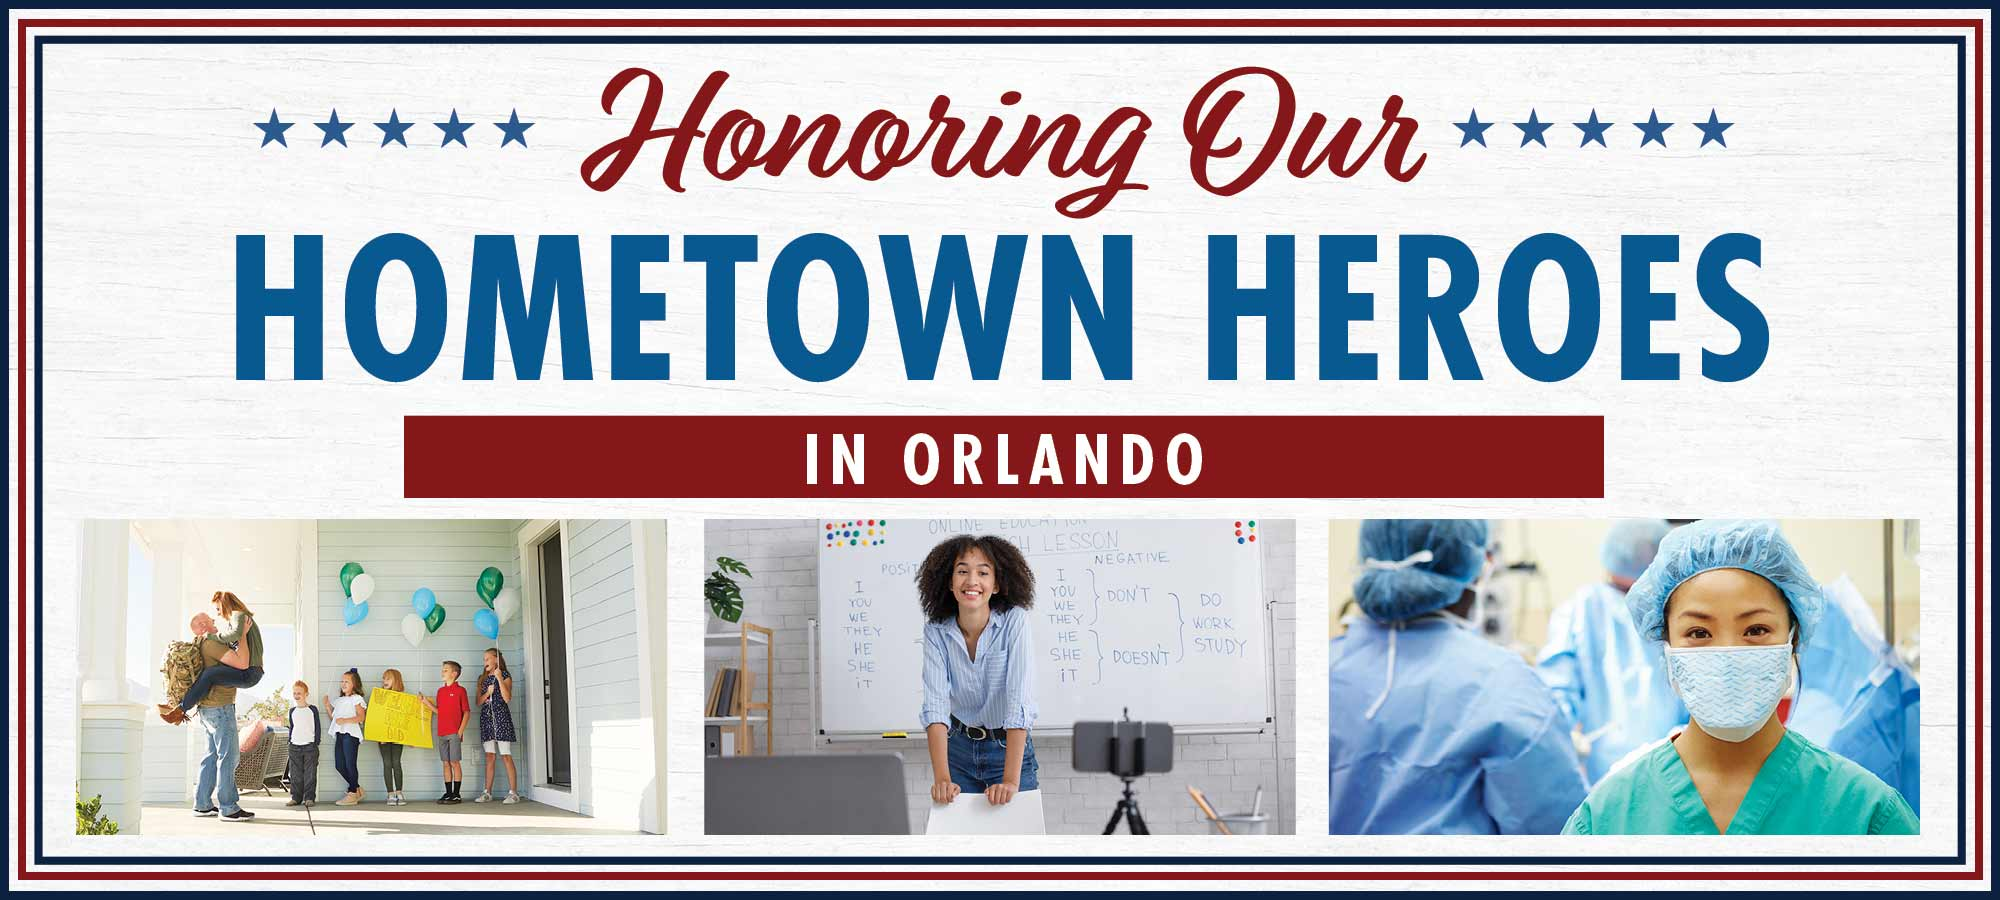 Salute to Hometown Heroes in Orlando